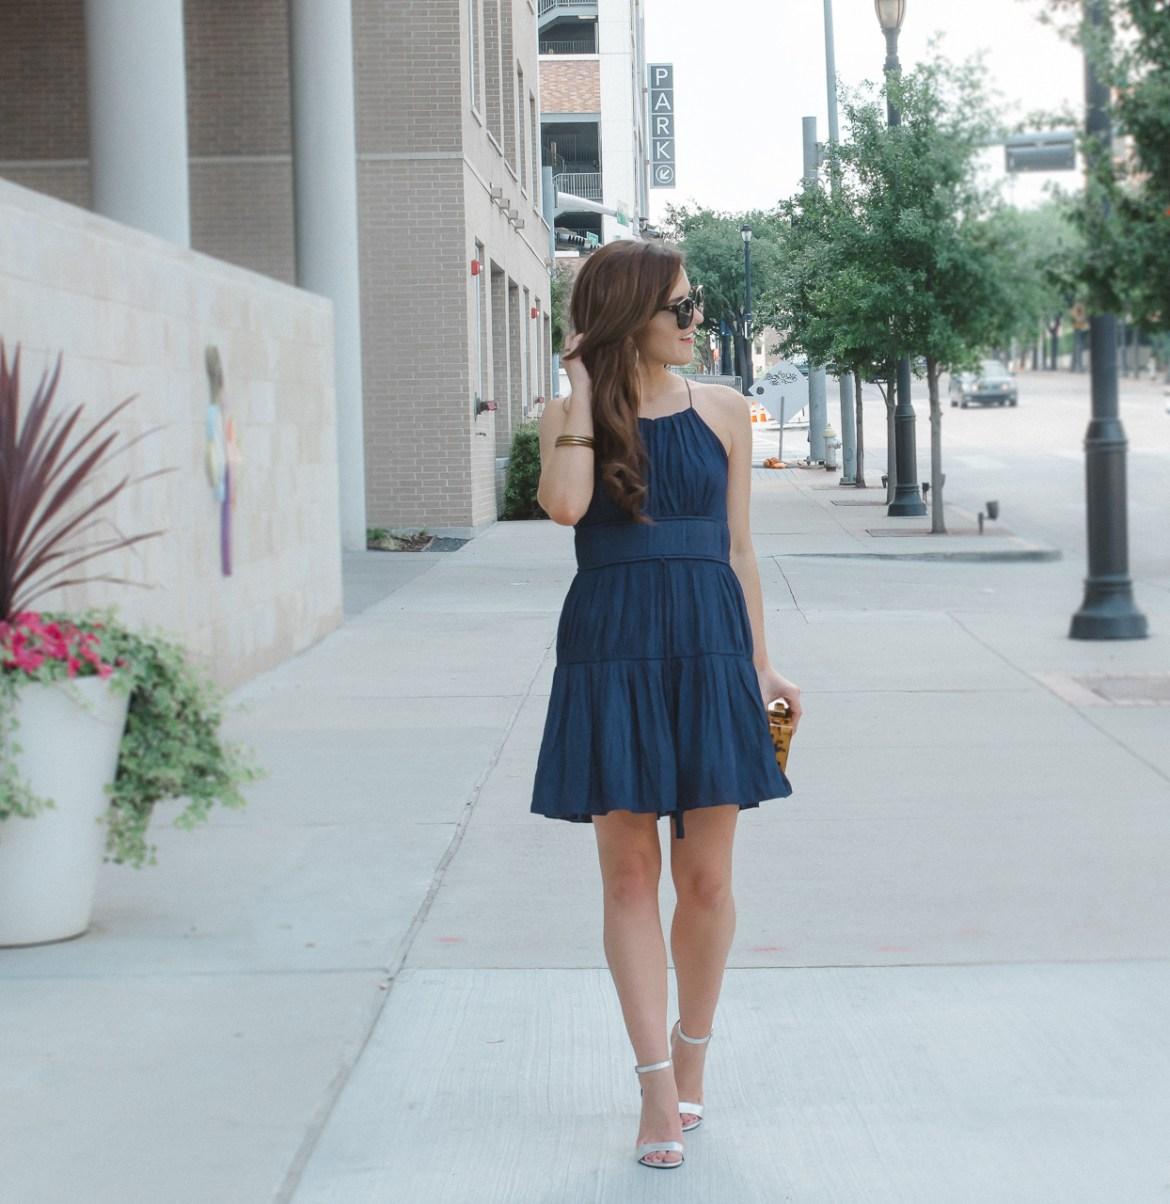 Navy Dress (17 of 23)